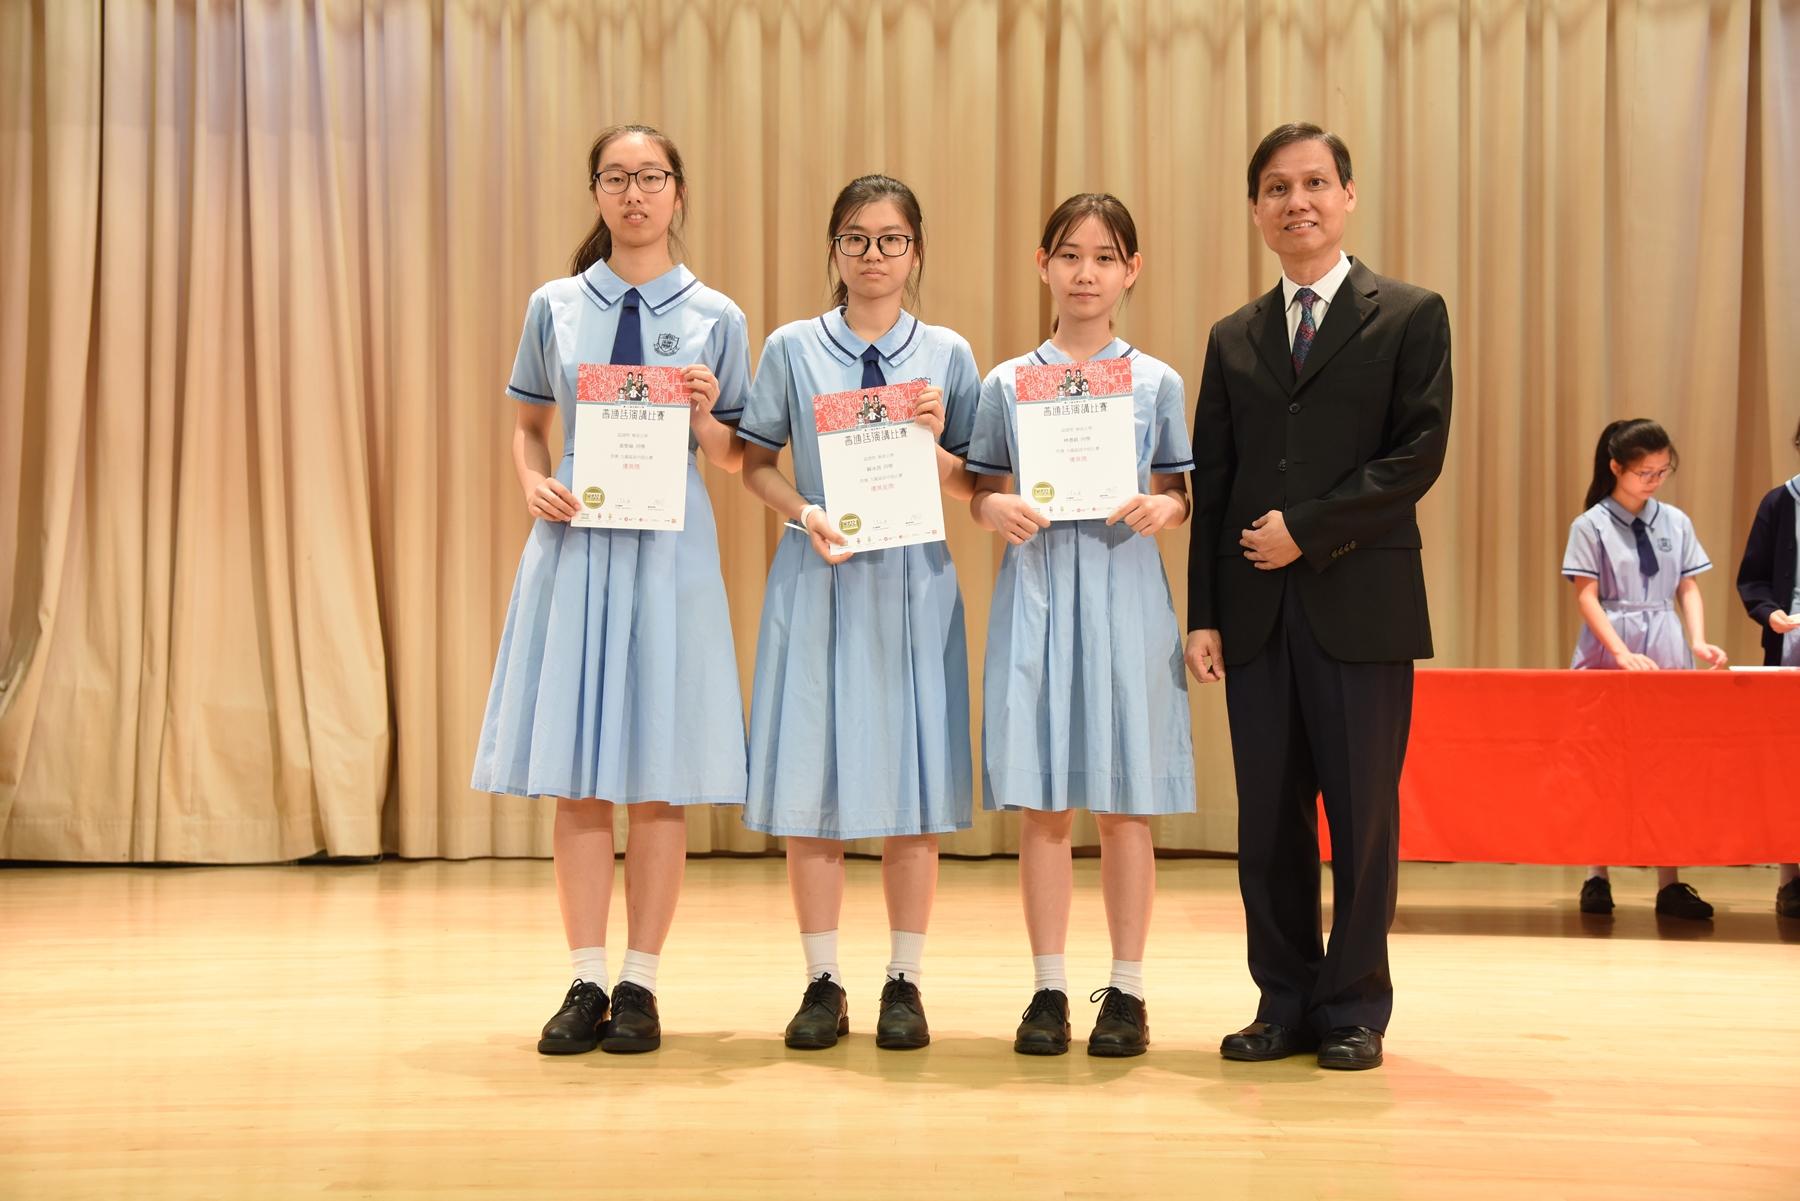 http://npc.edu.hk/sites/default/files/dsc_3925.jpg